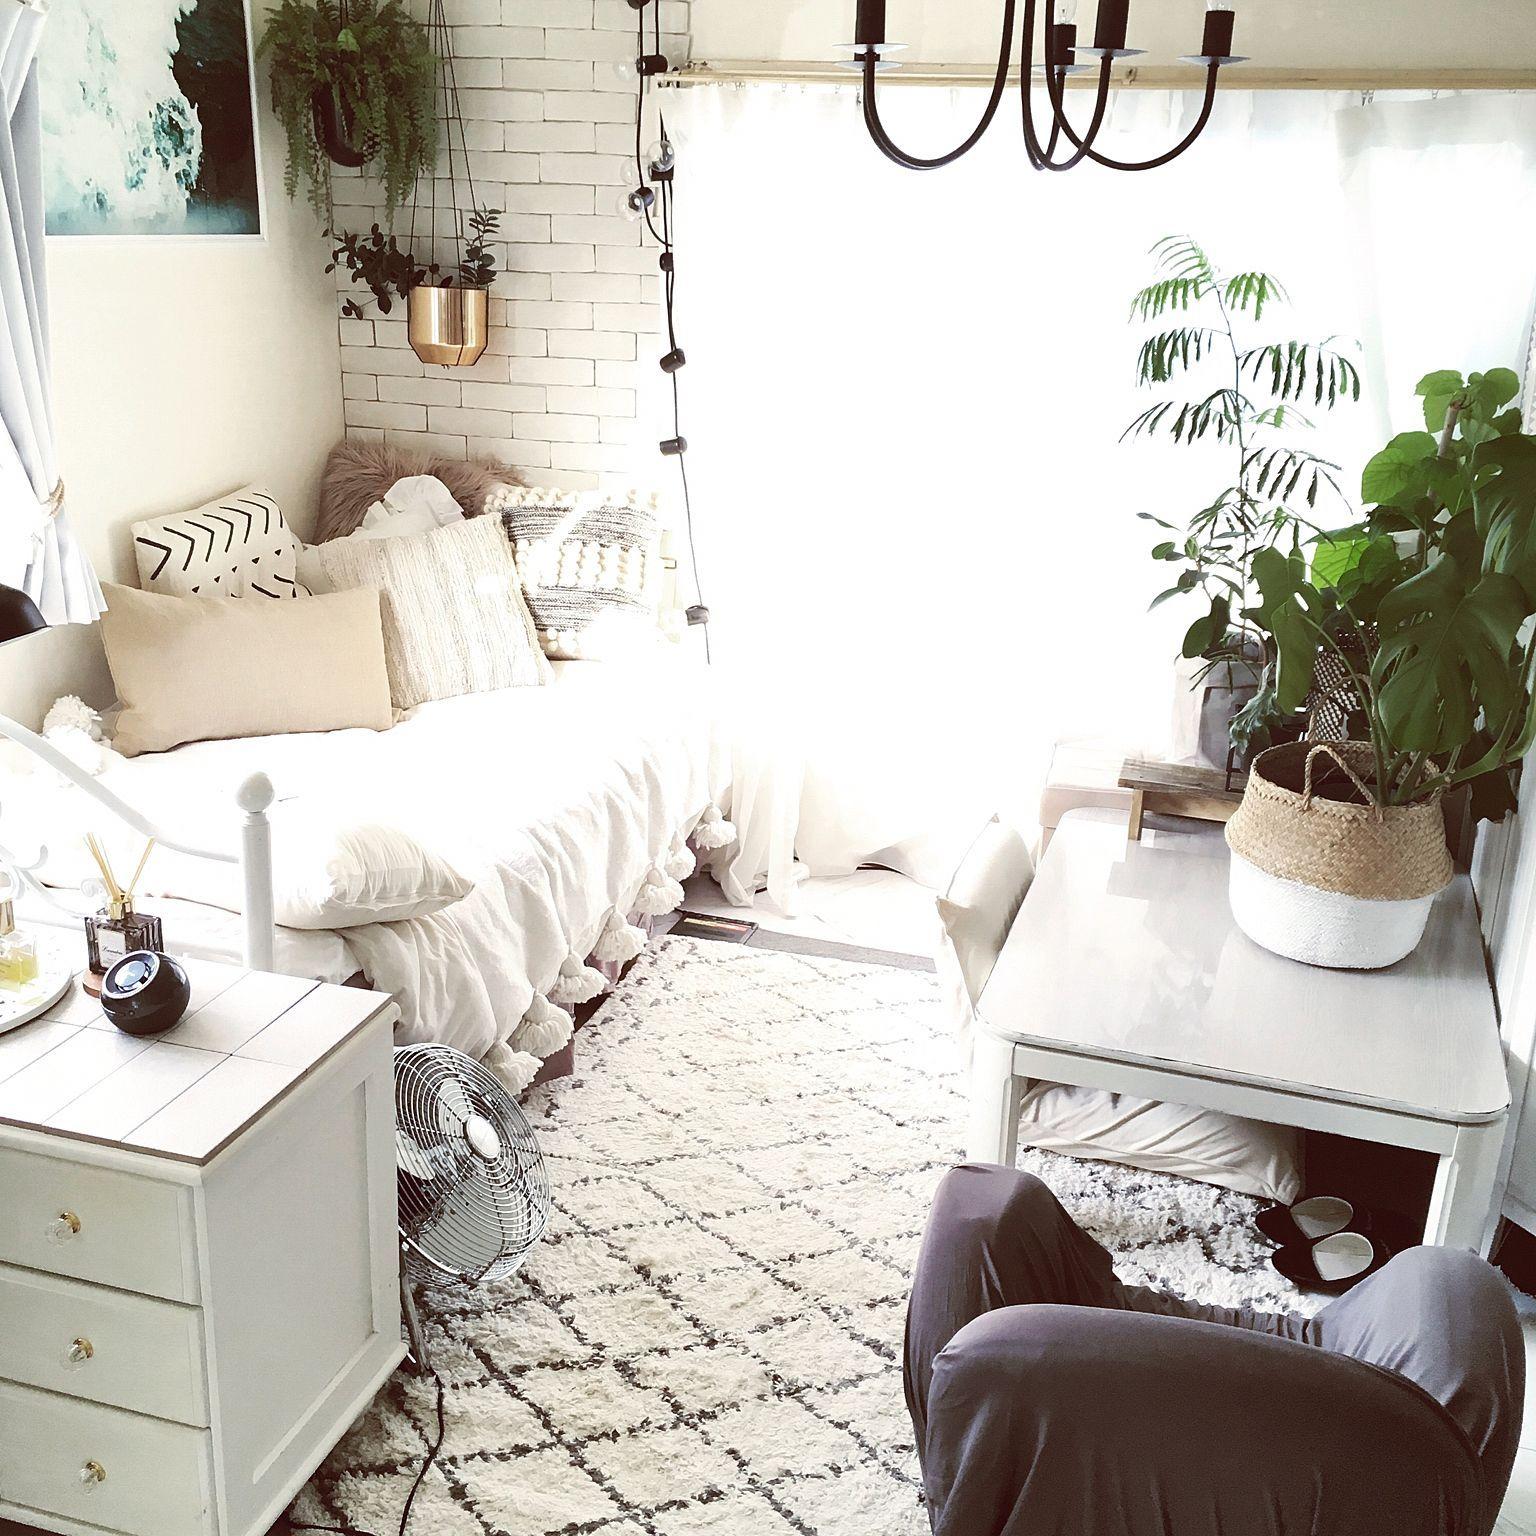 Photo of ベッド周り/ベッドカバー/無垢材の床/パイン無垢材/ブルーの壁紙…などのインテリア実例 – 2017-12-22 22:51:19 | RoomClip(ルームクリップ)